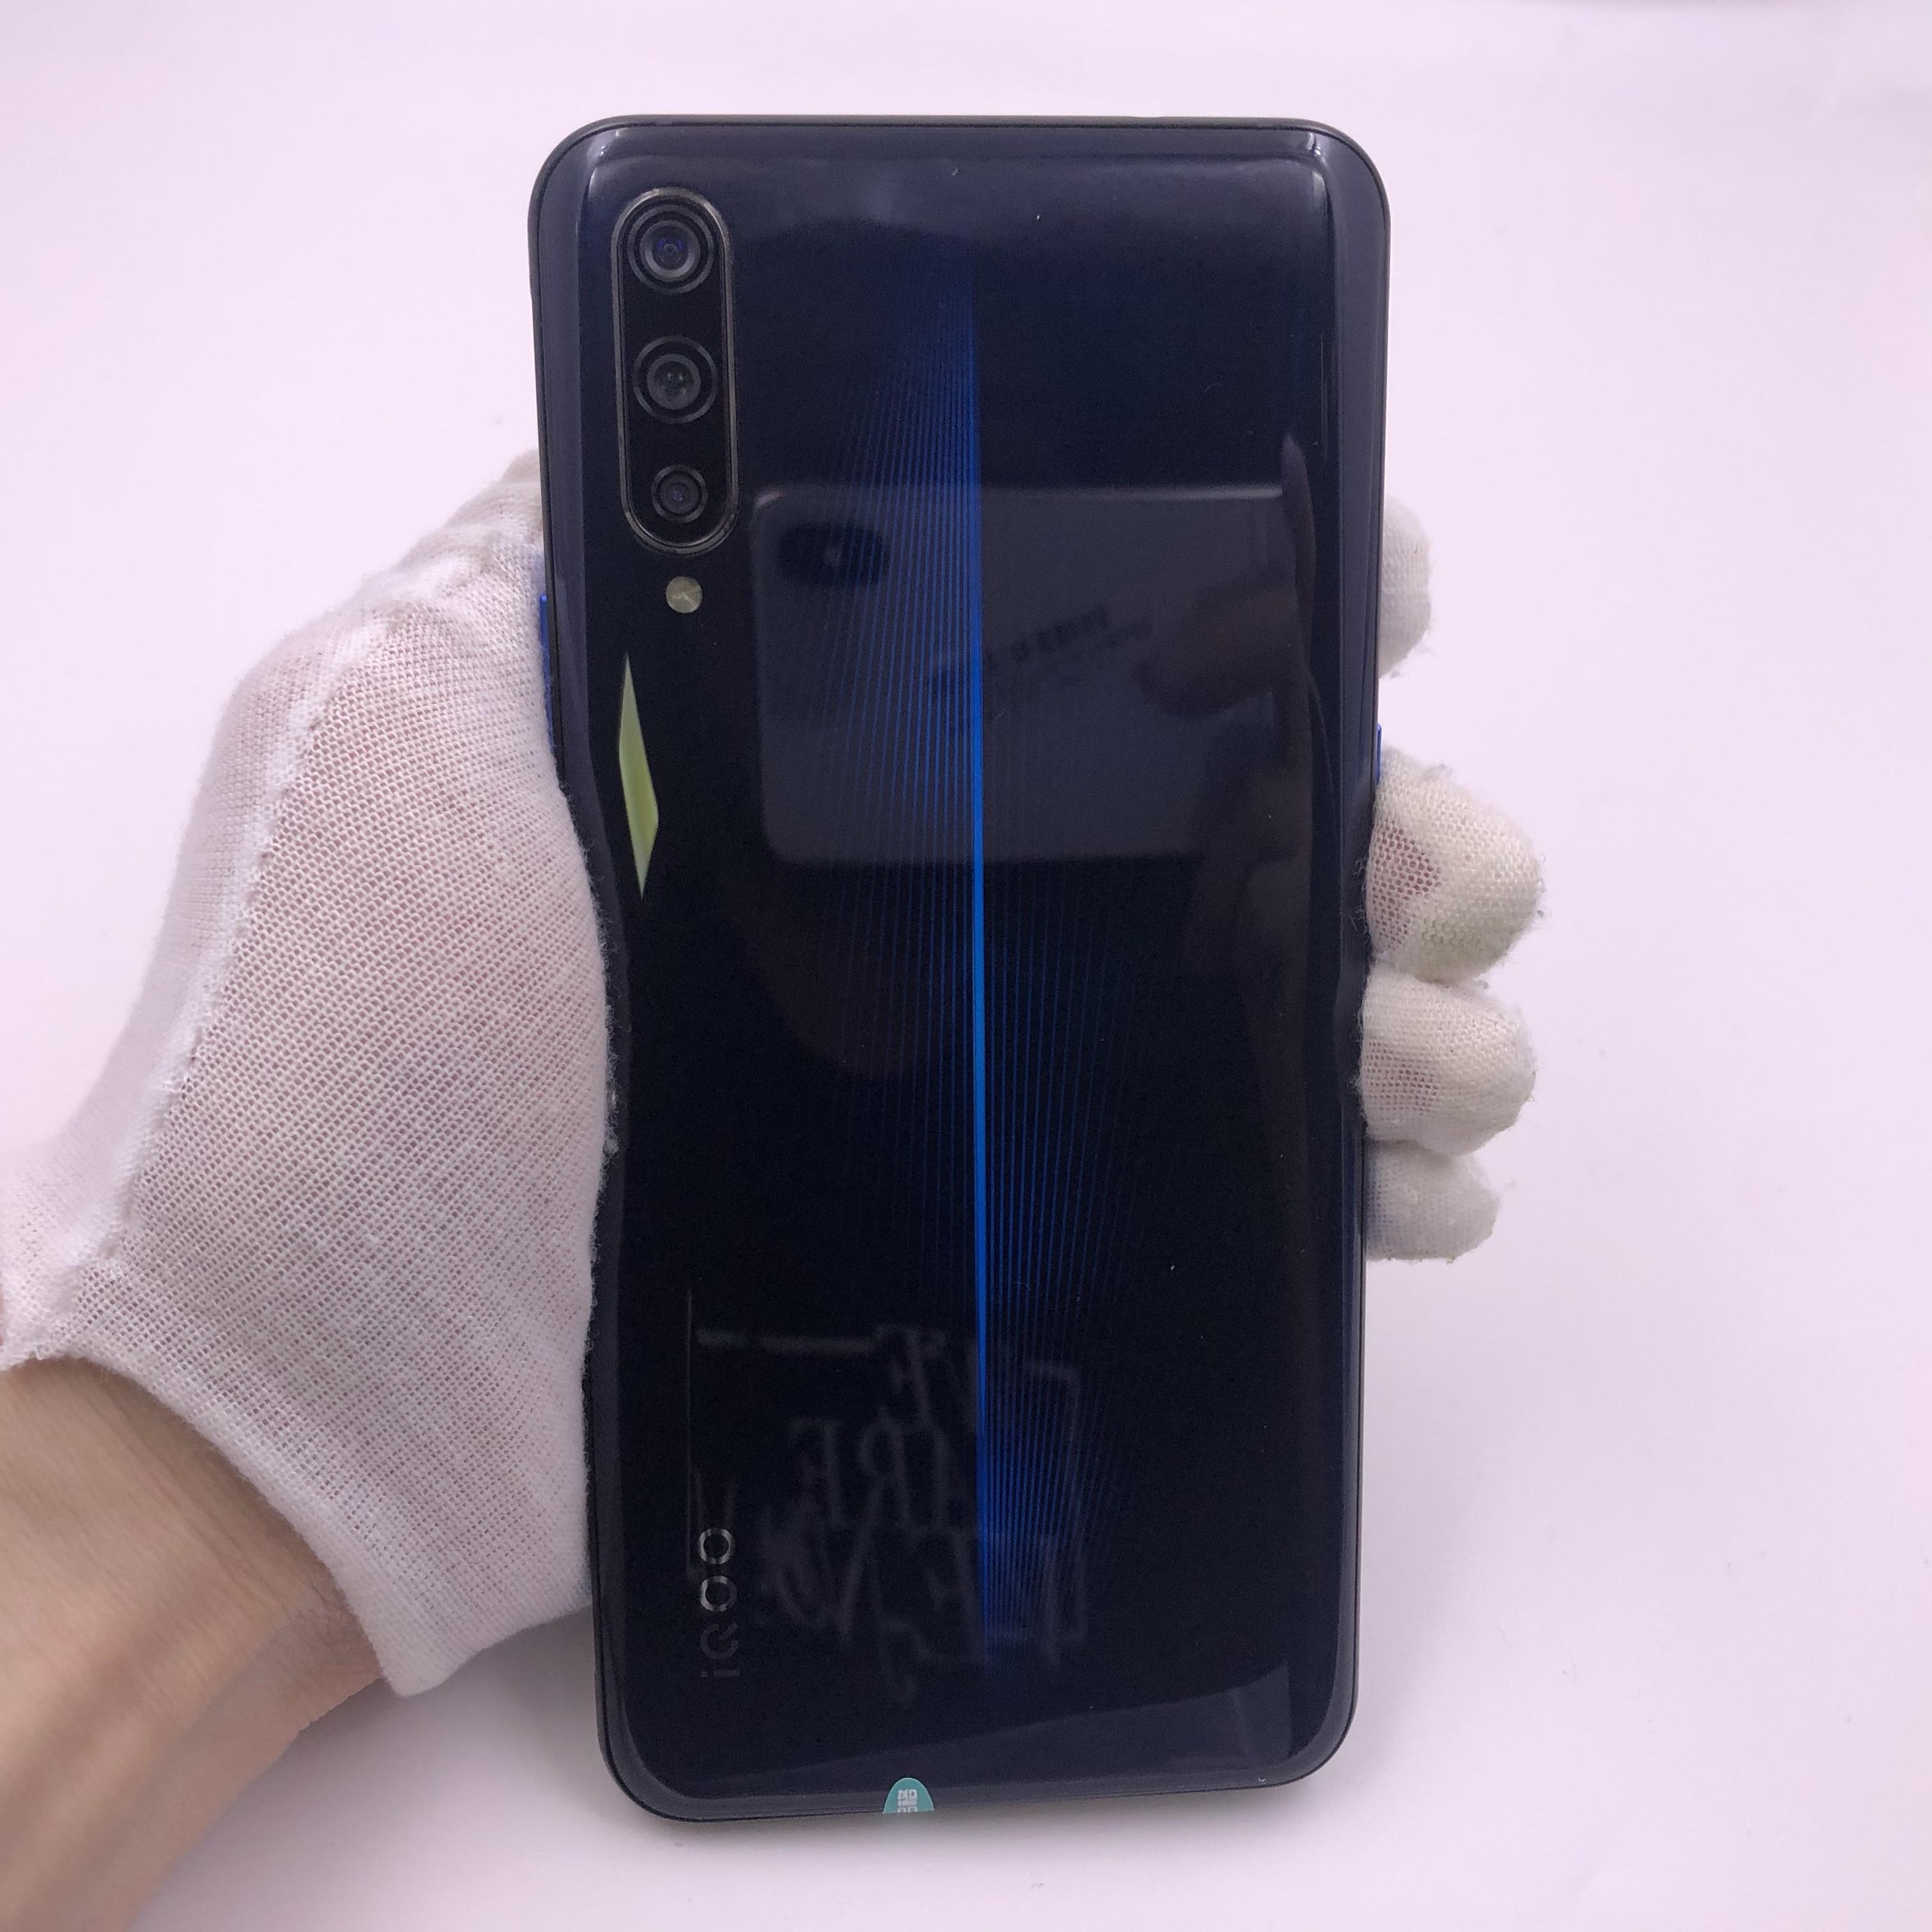 vivo【vivo iQOO】4G全网通 蓝色 8G/128G 国行 9成新